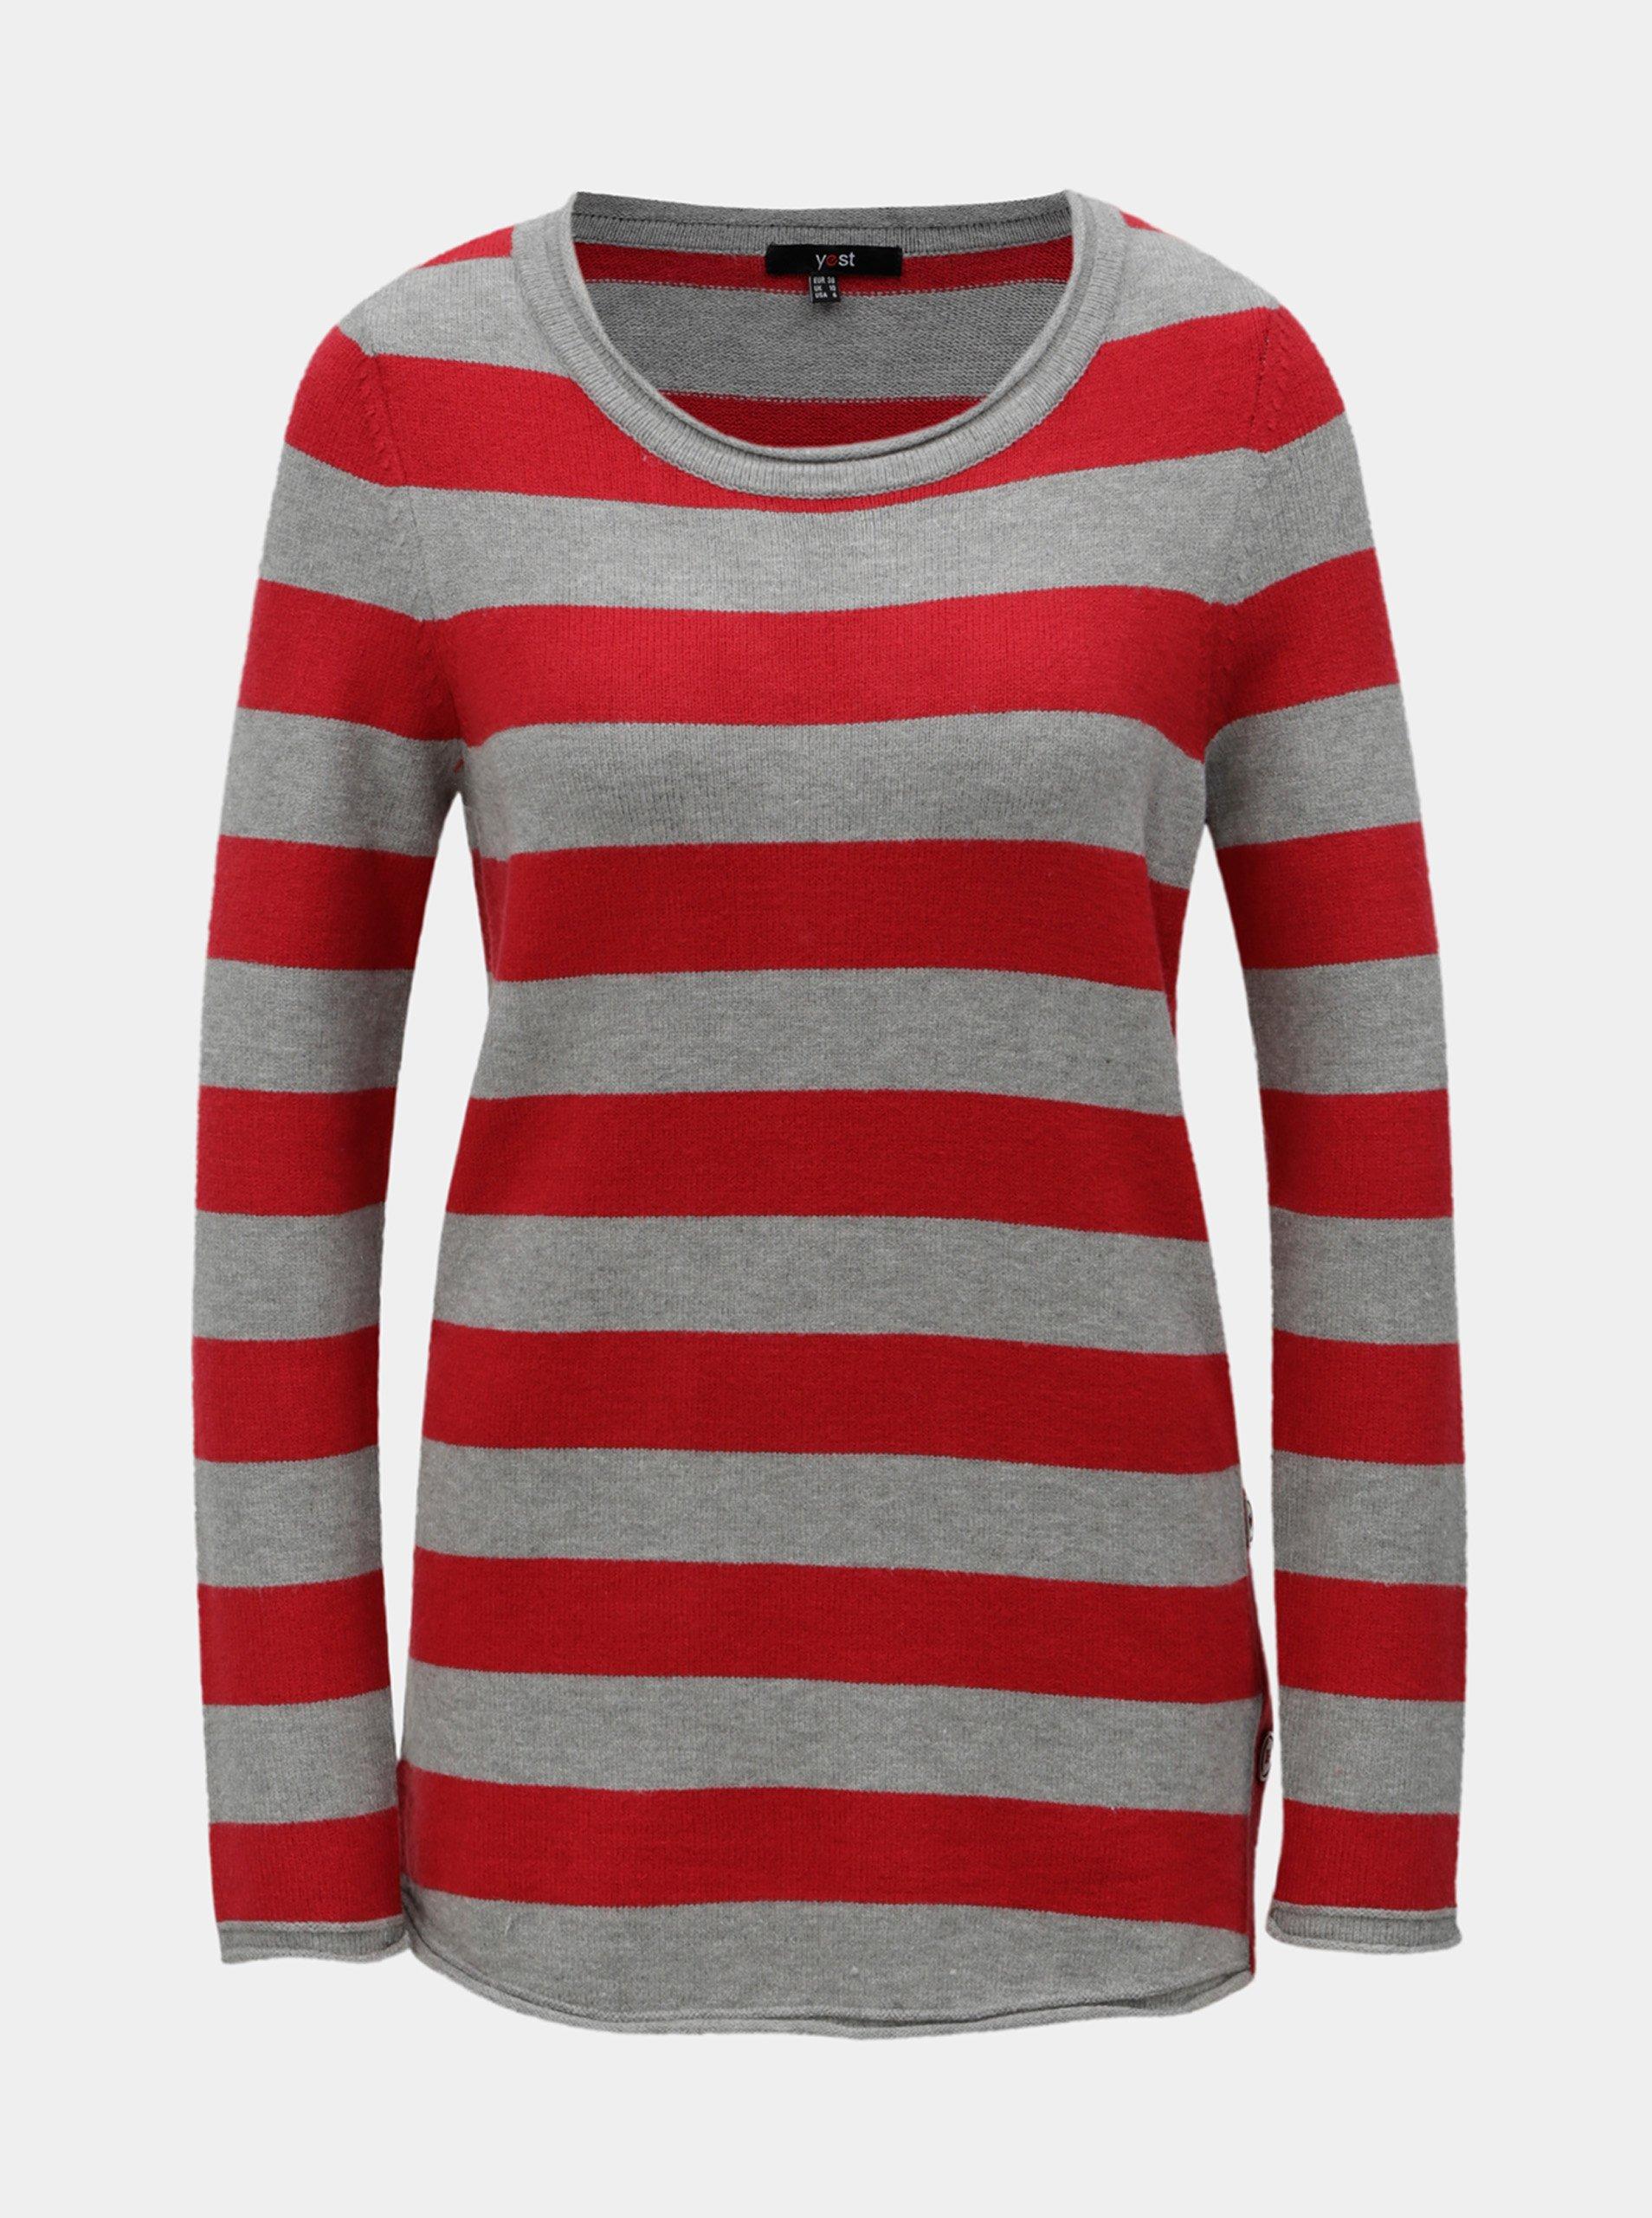 e9ee91e0497 Šedo-červený pruhovaný svetr s knoflíky na boku Yest